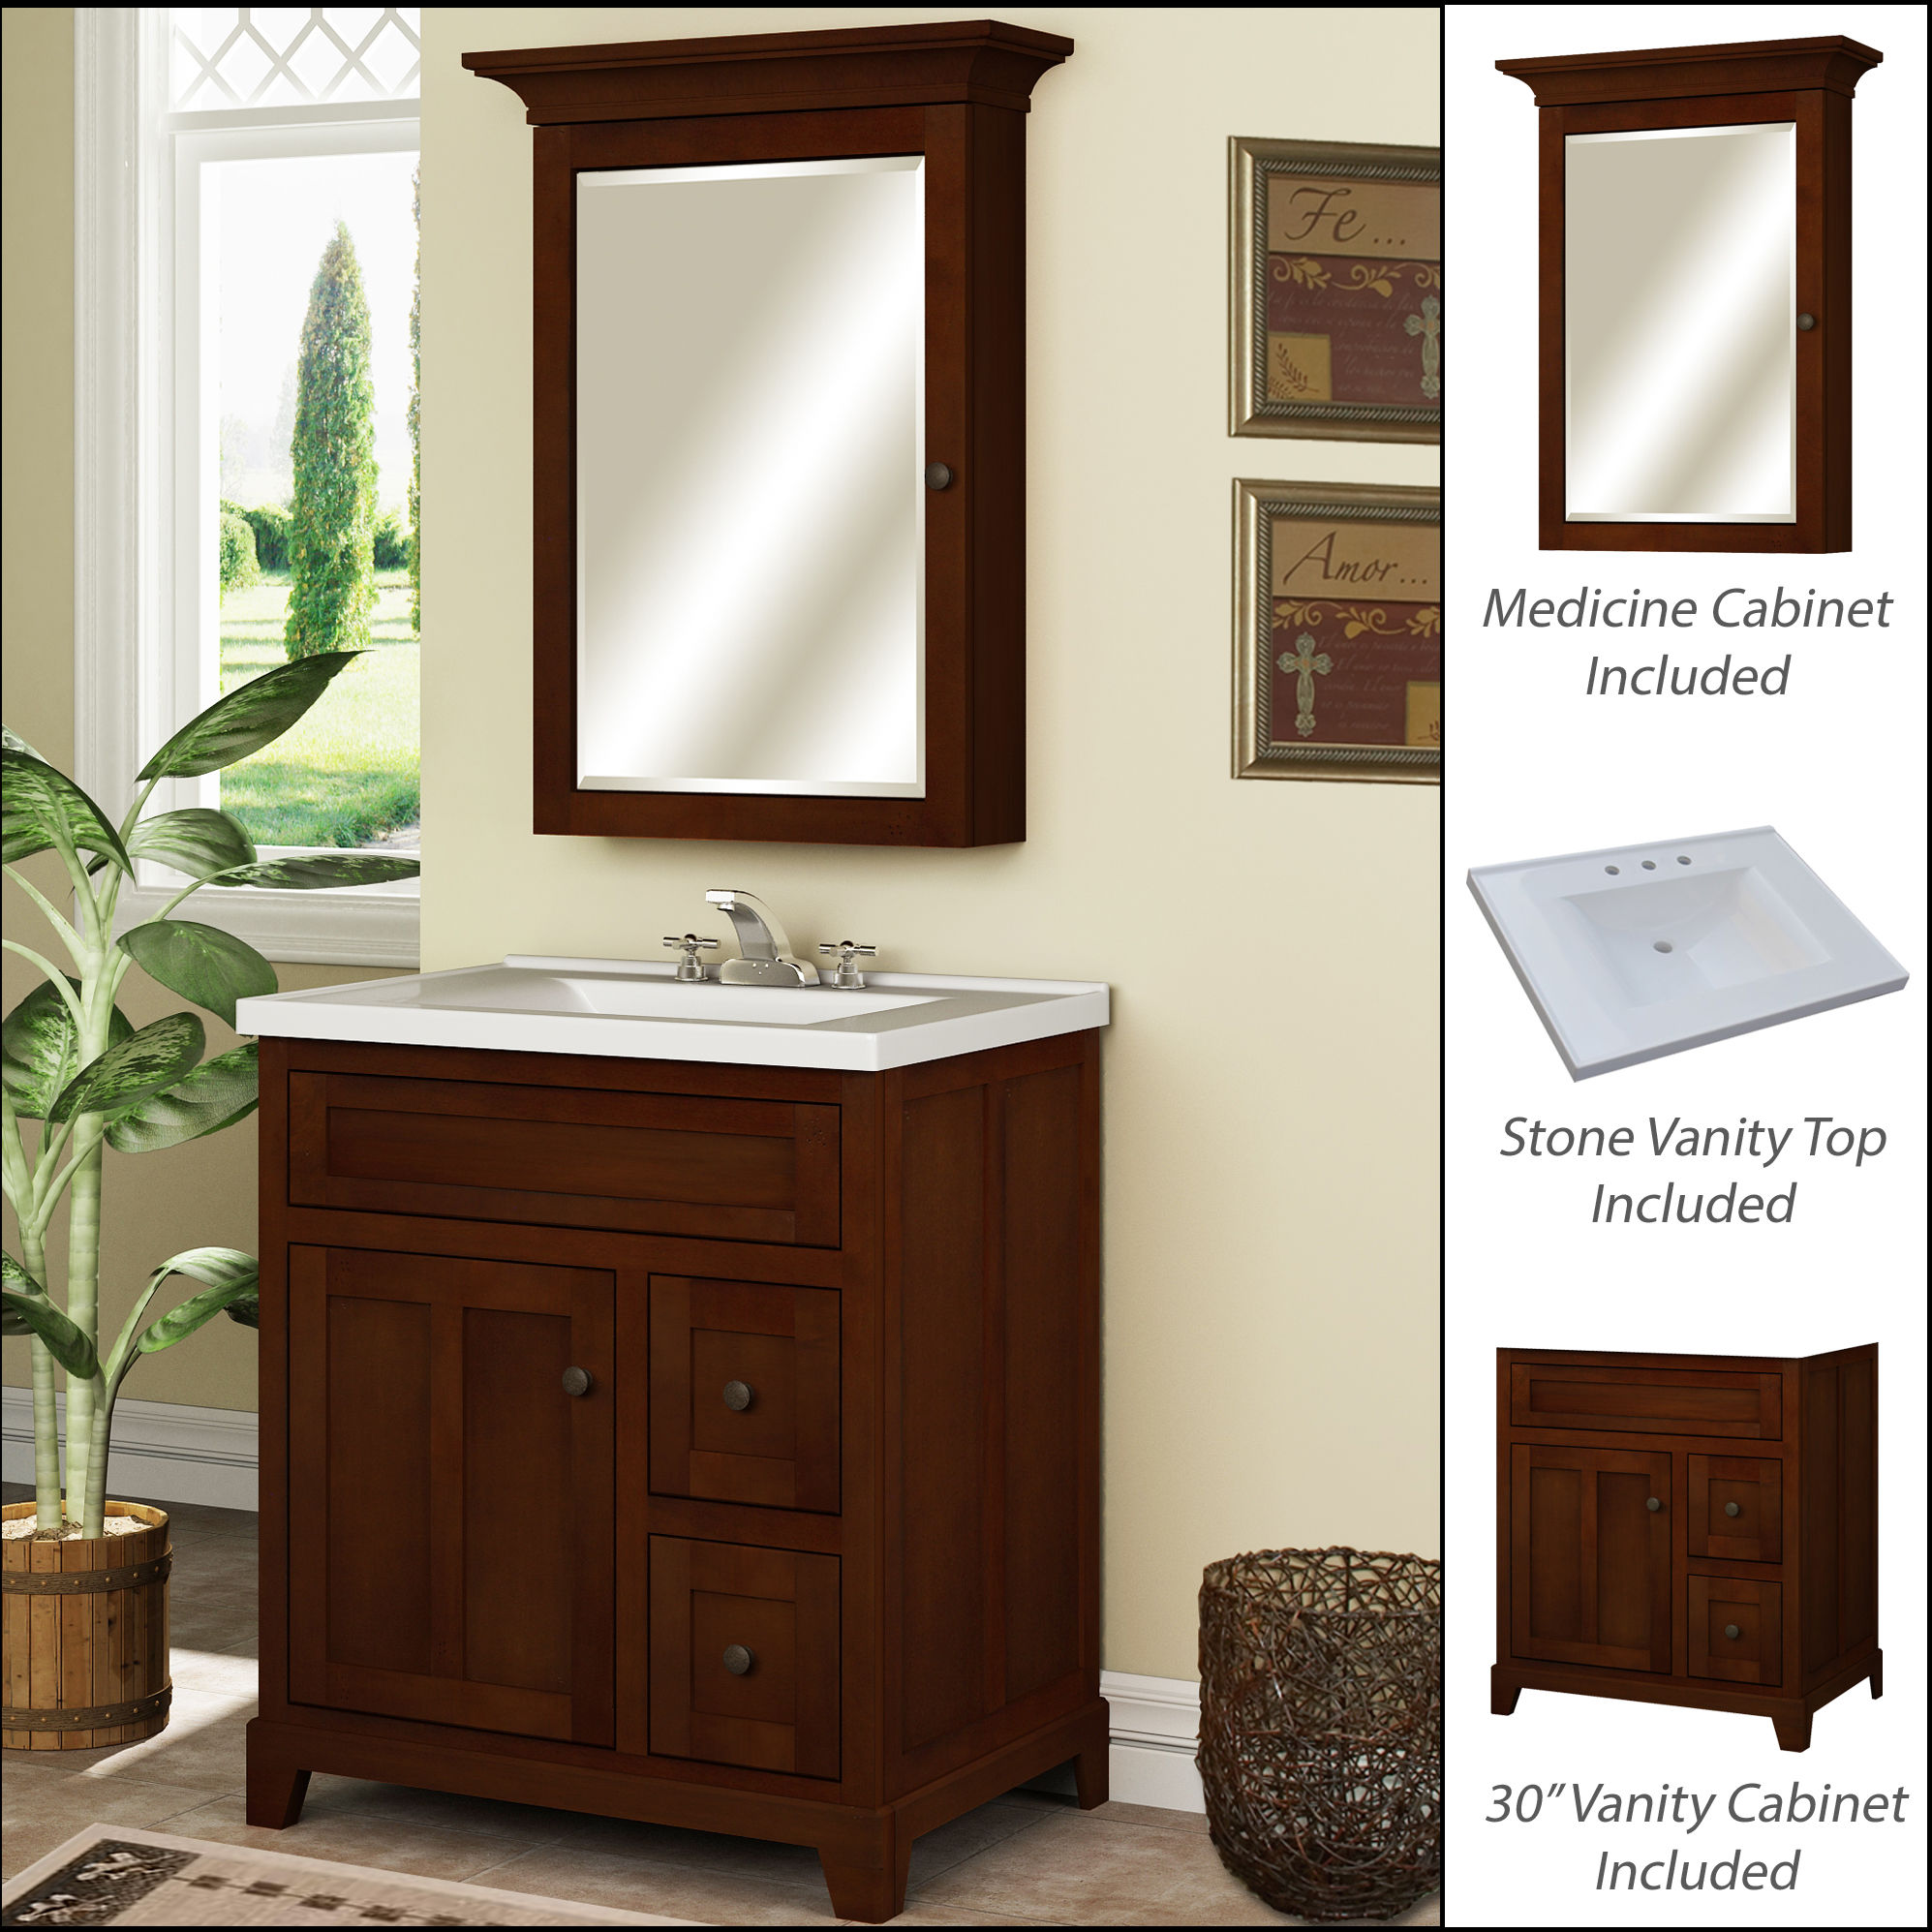 cabinet for whitewash venica under undermount sink vanity vanities teak bathroom